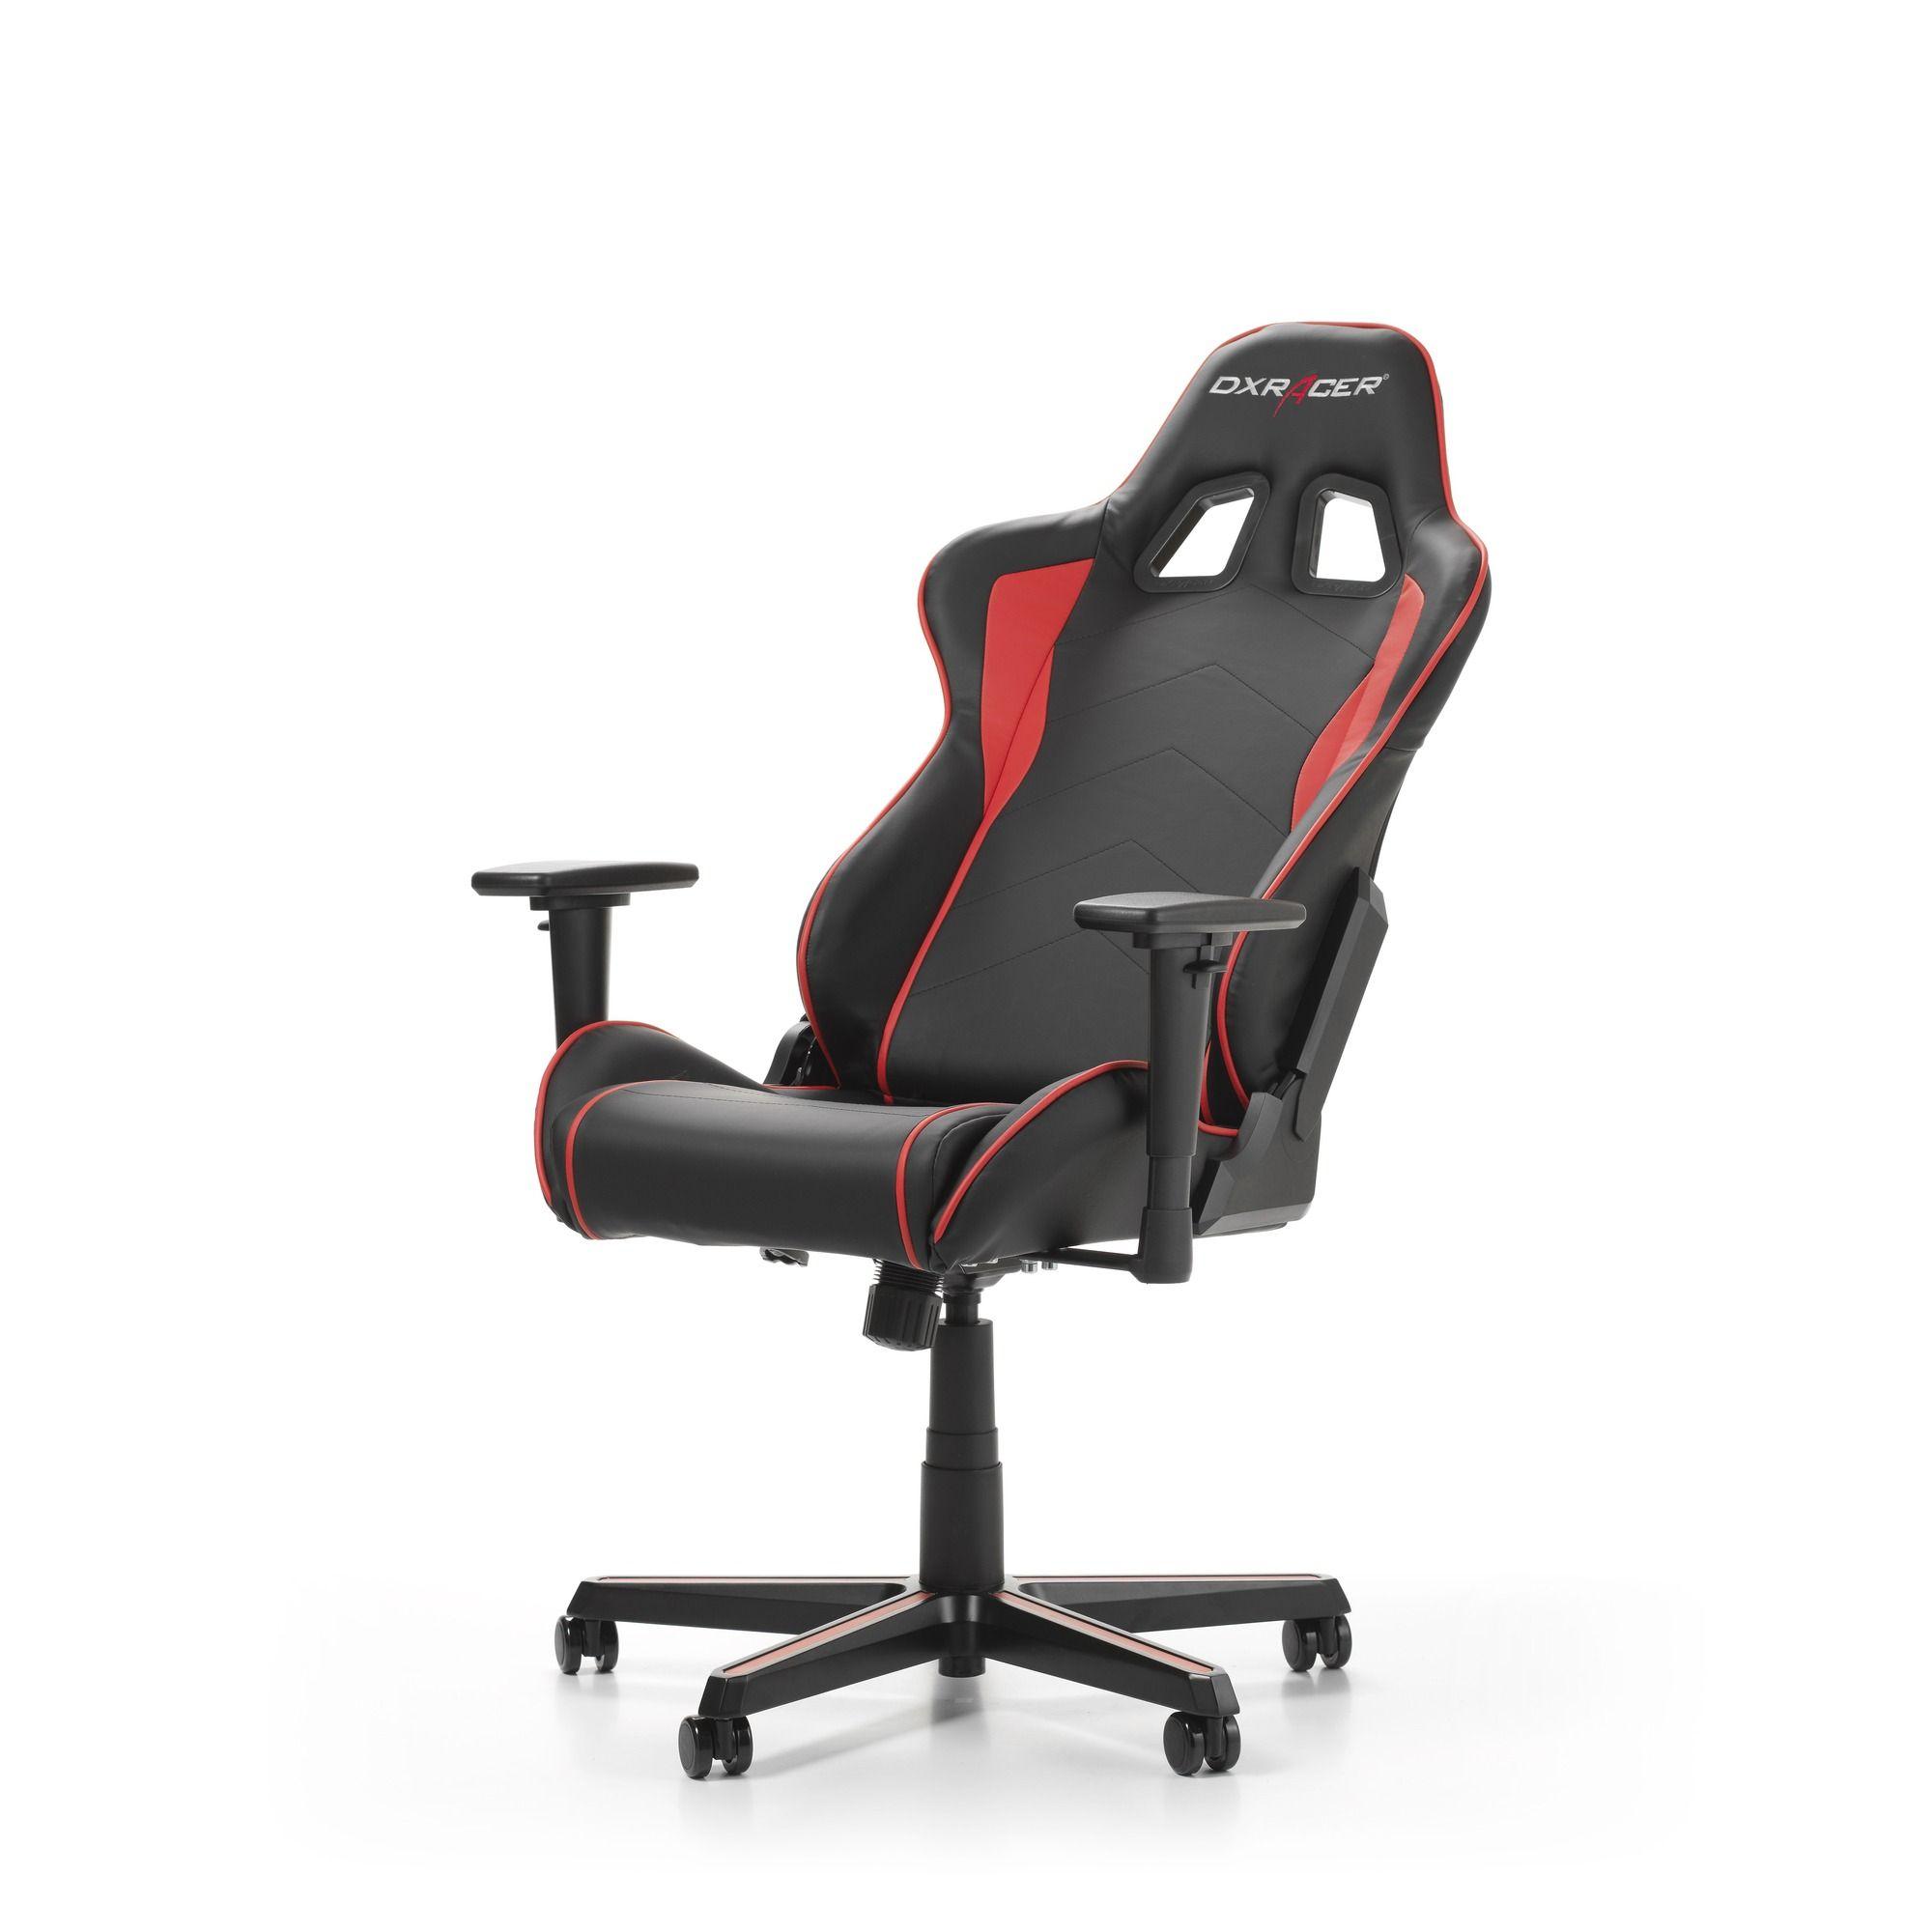 Гейминг стол DXRacer OH/FH08/NR - серия FORMULA, черен/червен - 6